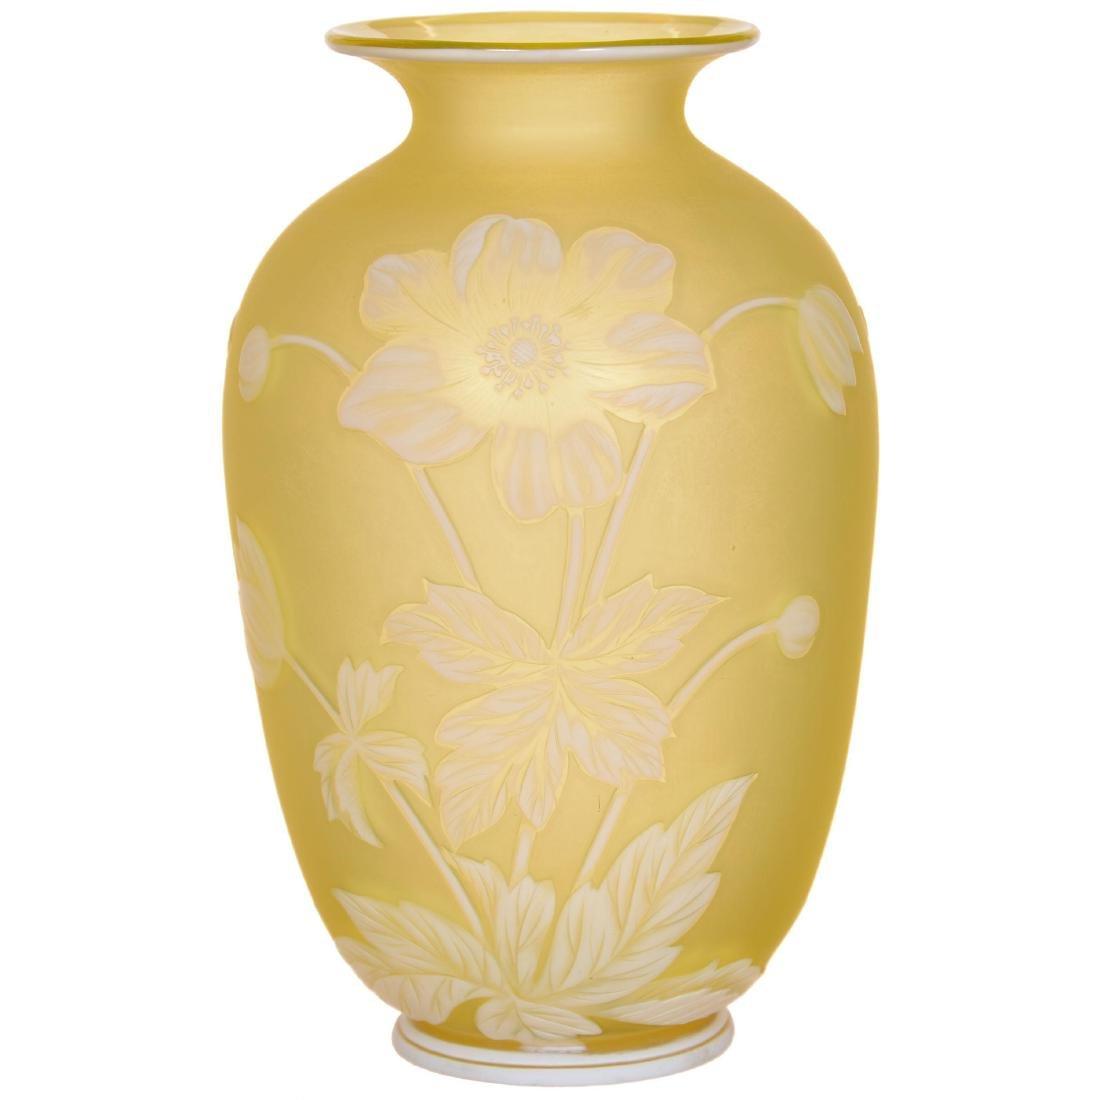 English Cameo Art Glass Vase